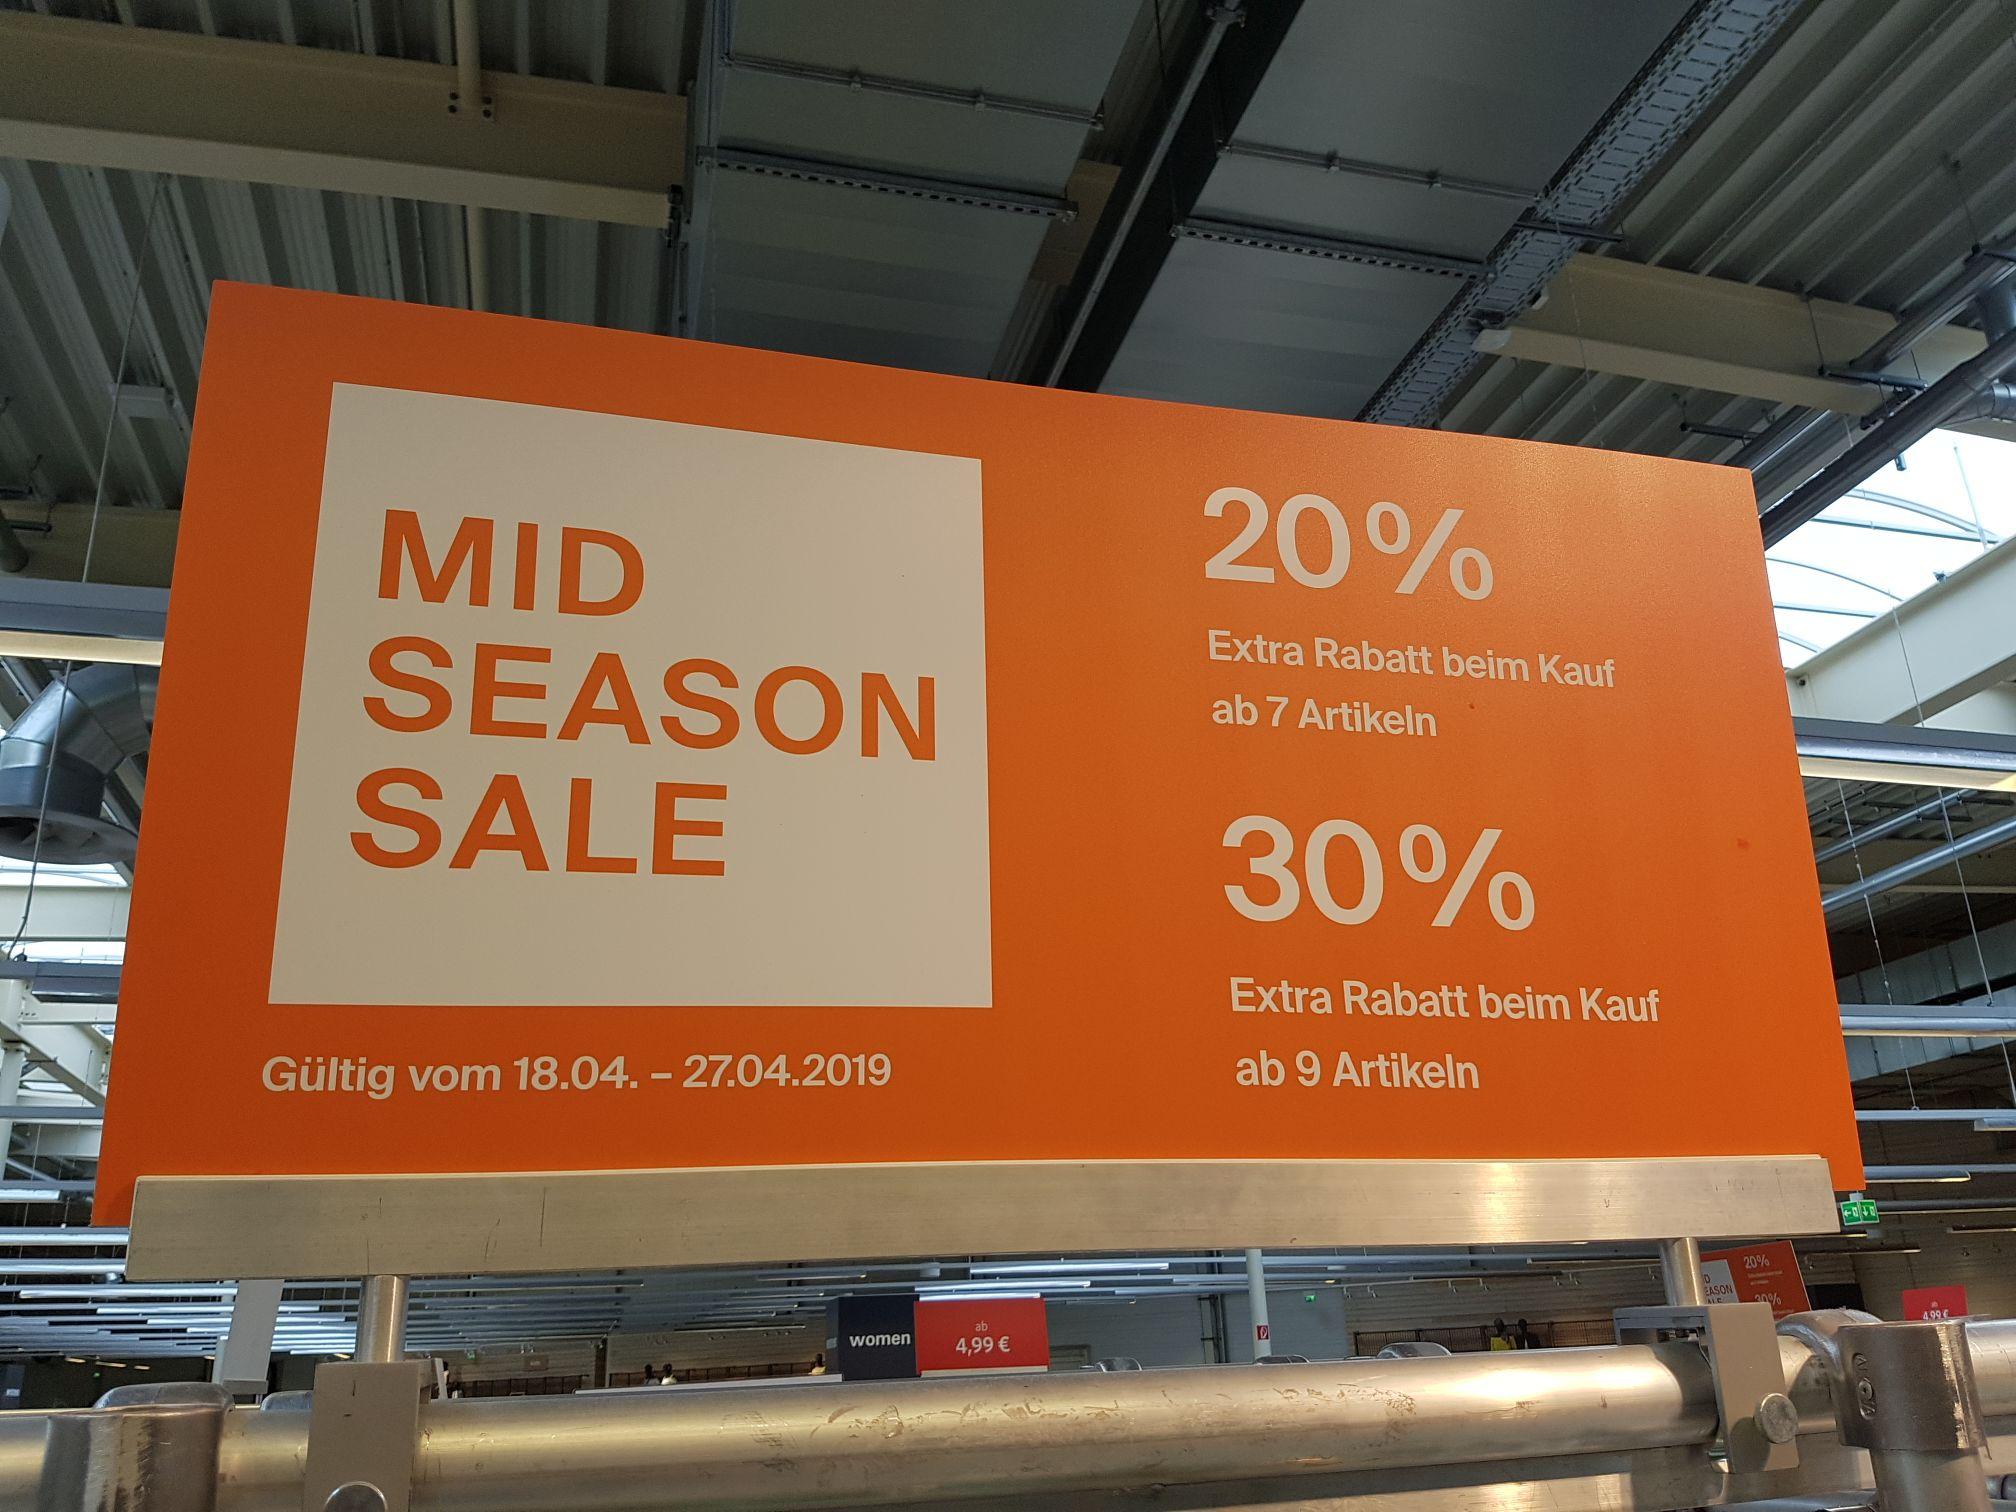 Lokal Ratingen Esprit Outlet 20% (30%) extra Rabatt